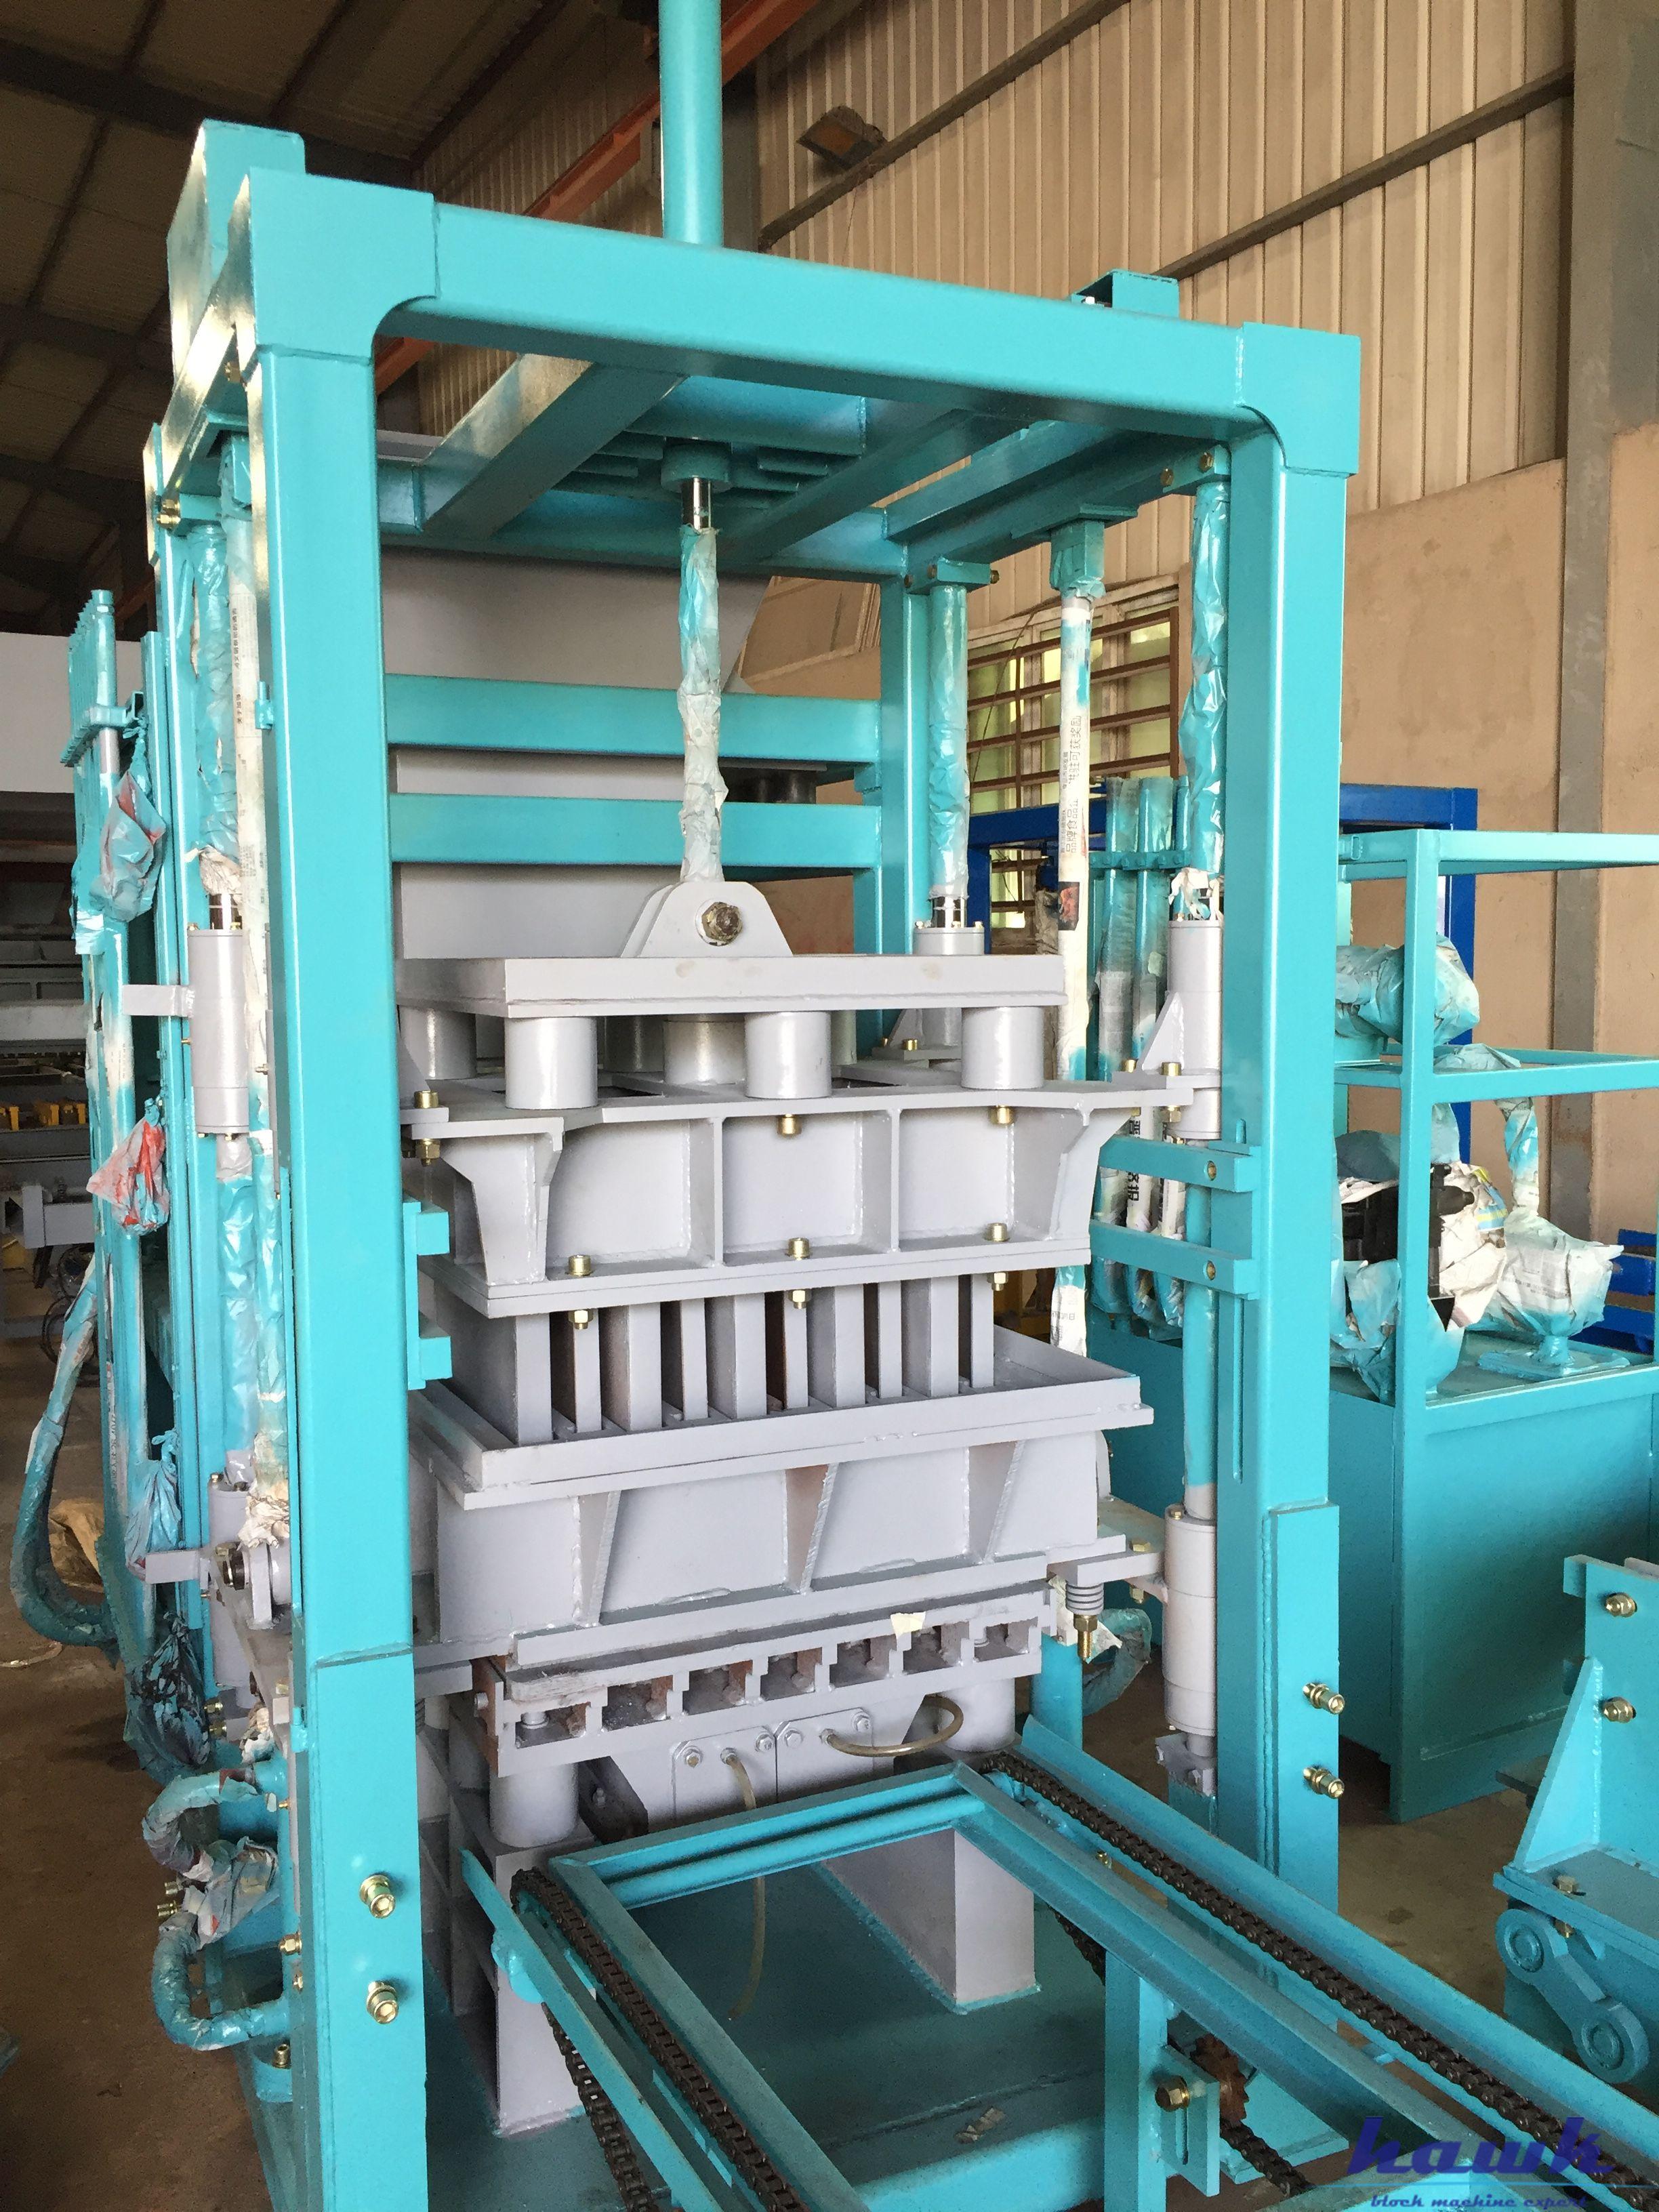 QT3-15 block making machine